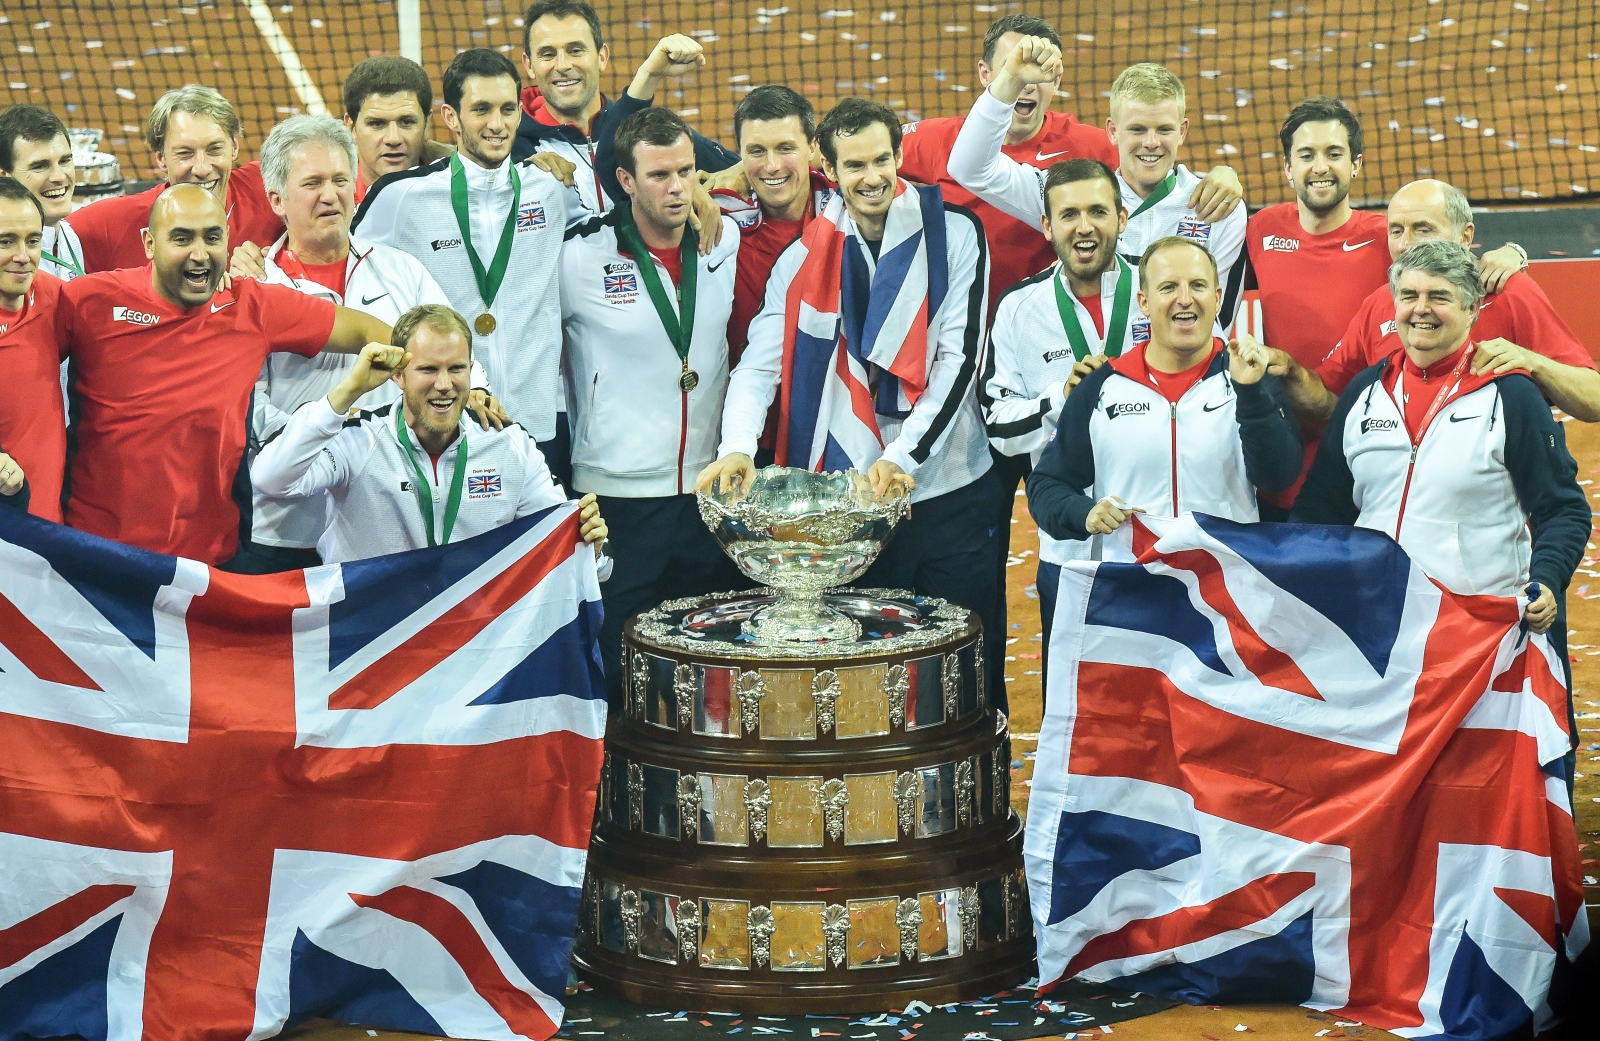 Britain won the Davis Cup in 2015